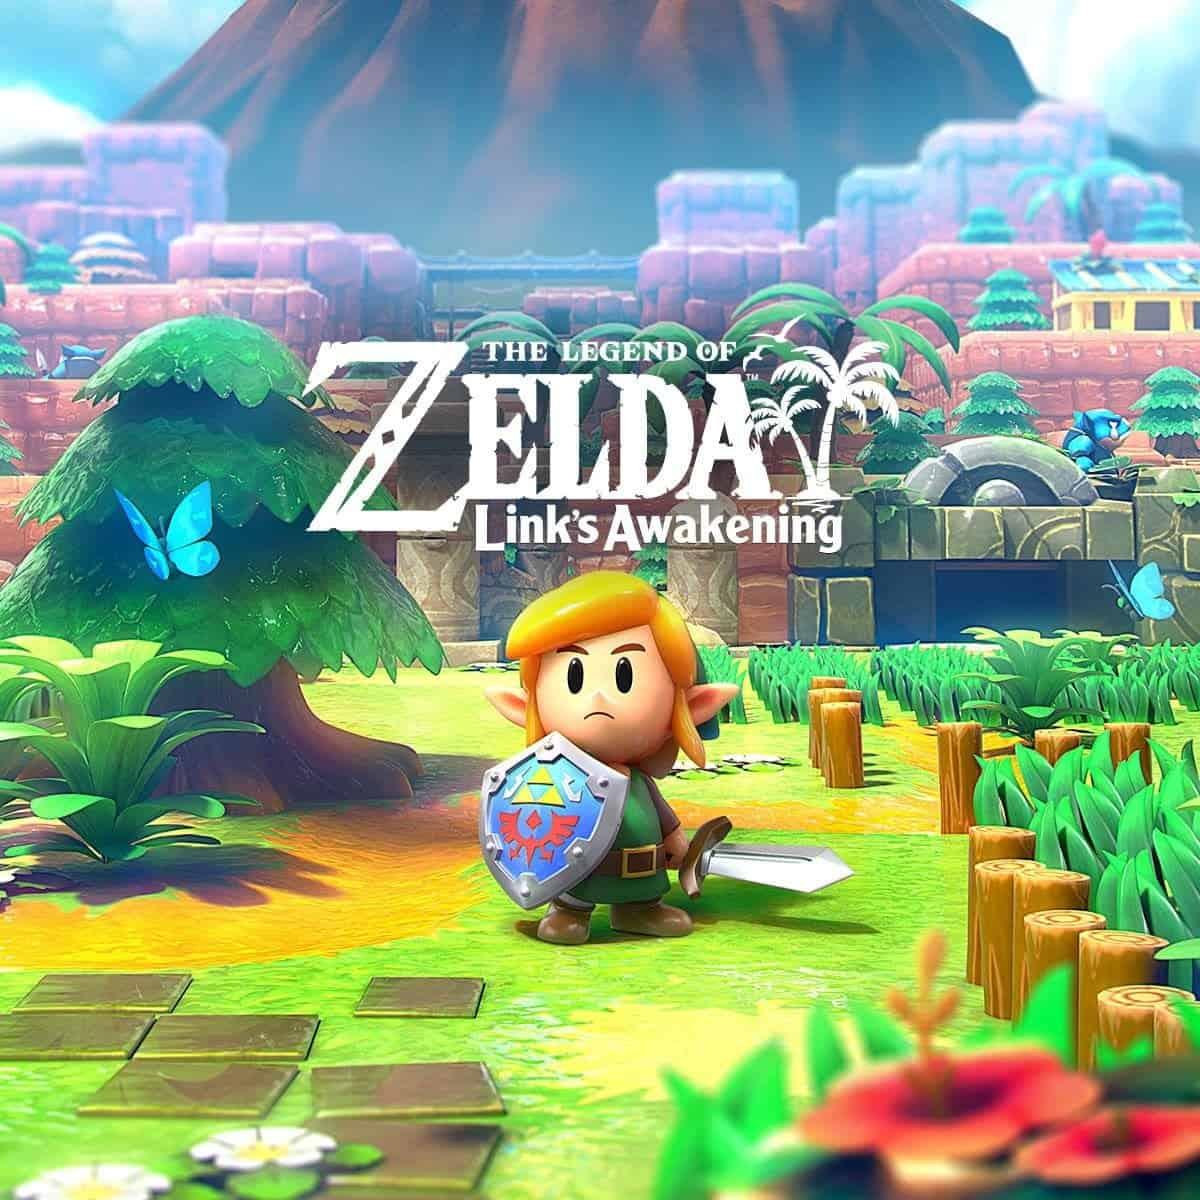 The Legend of Zelda Link's Awakening (Switch) Review